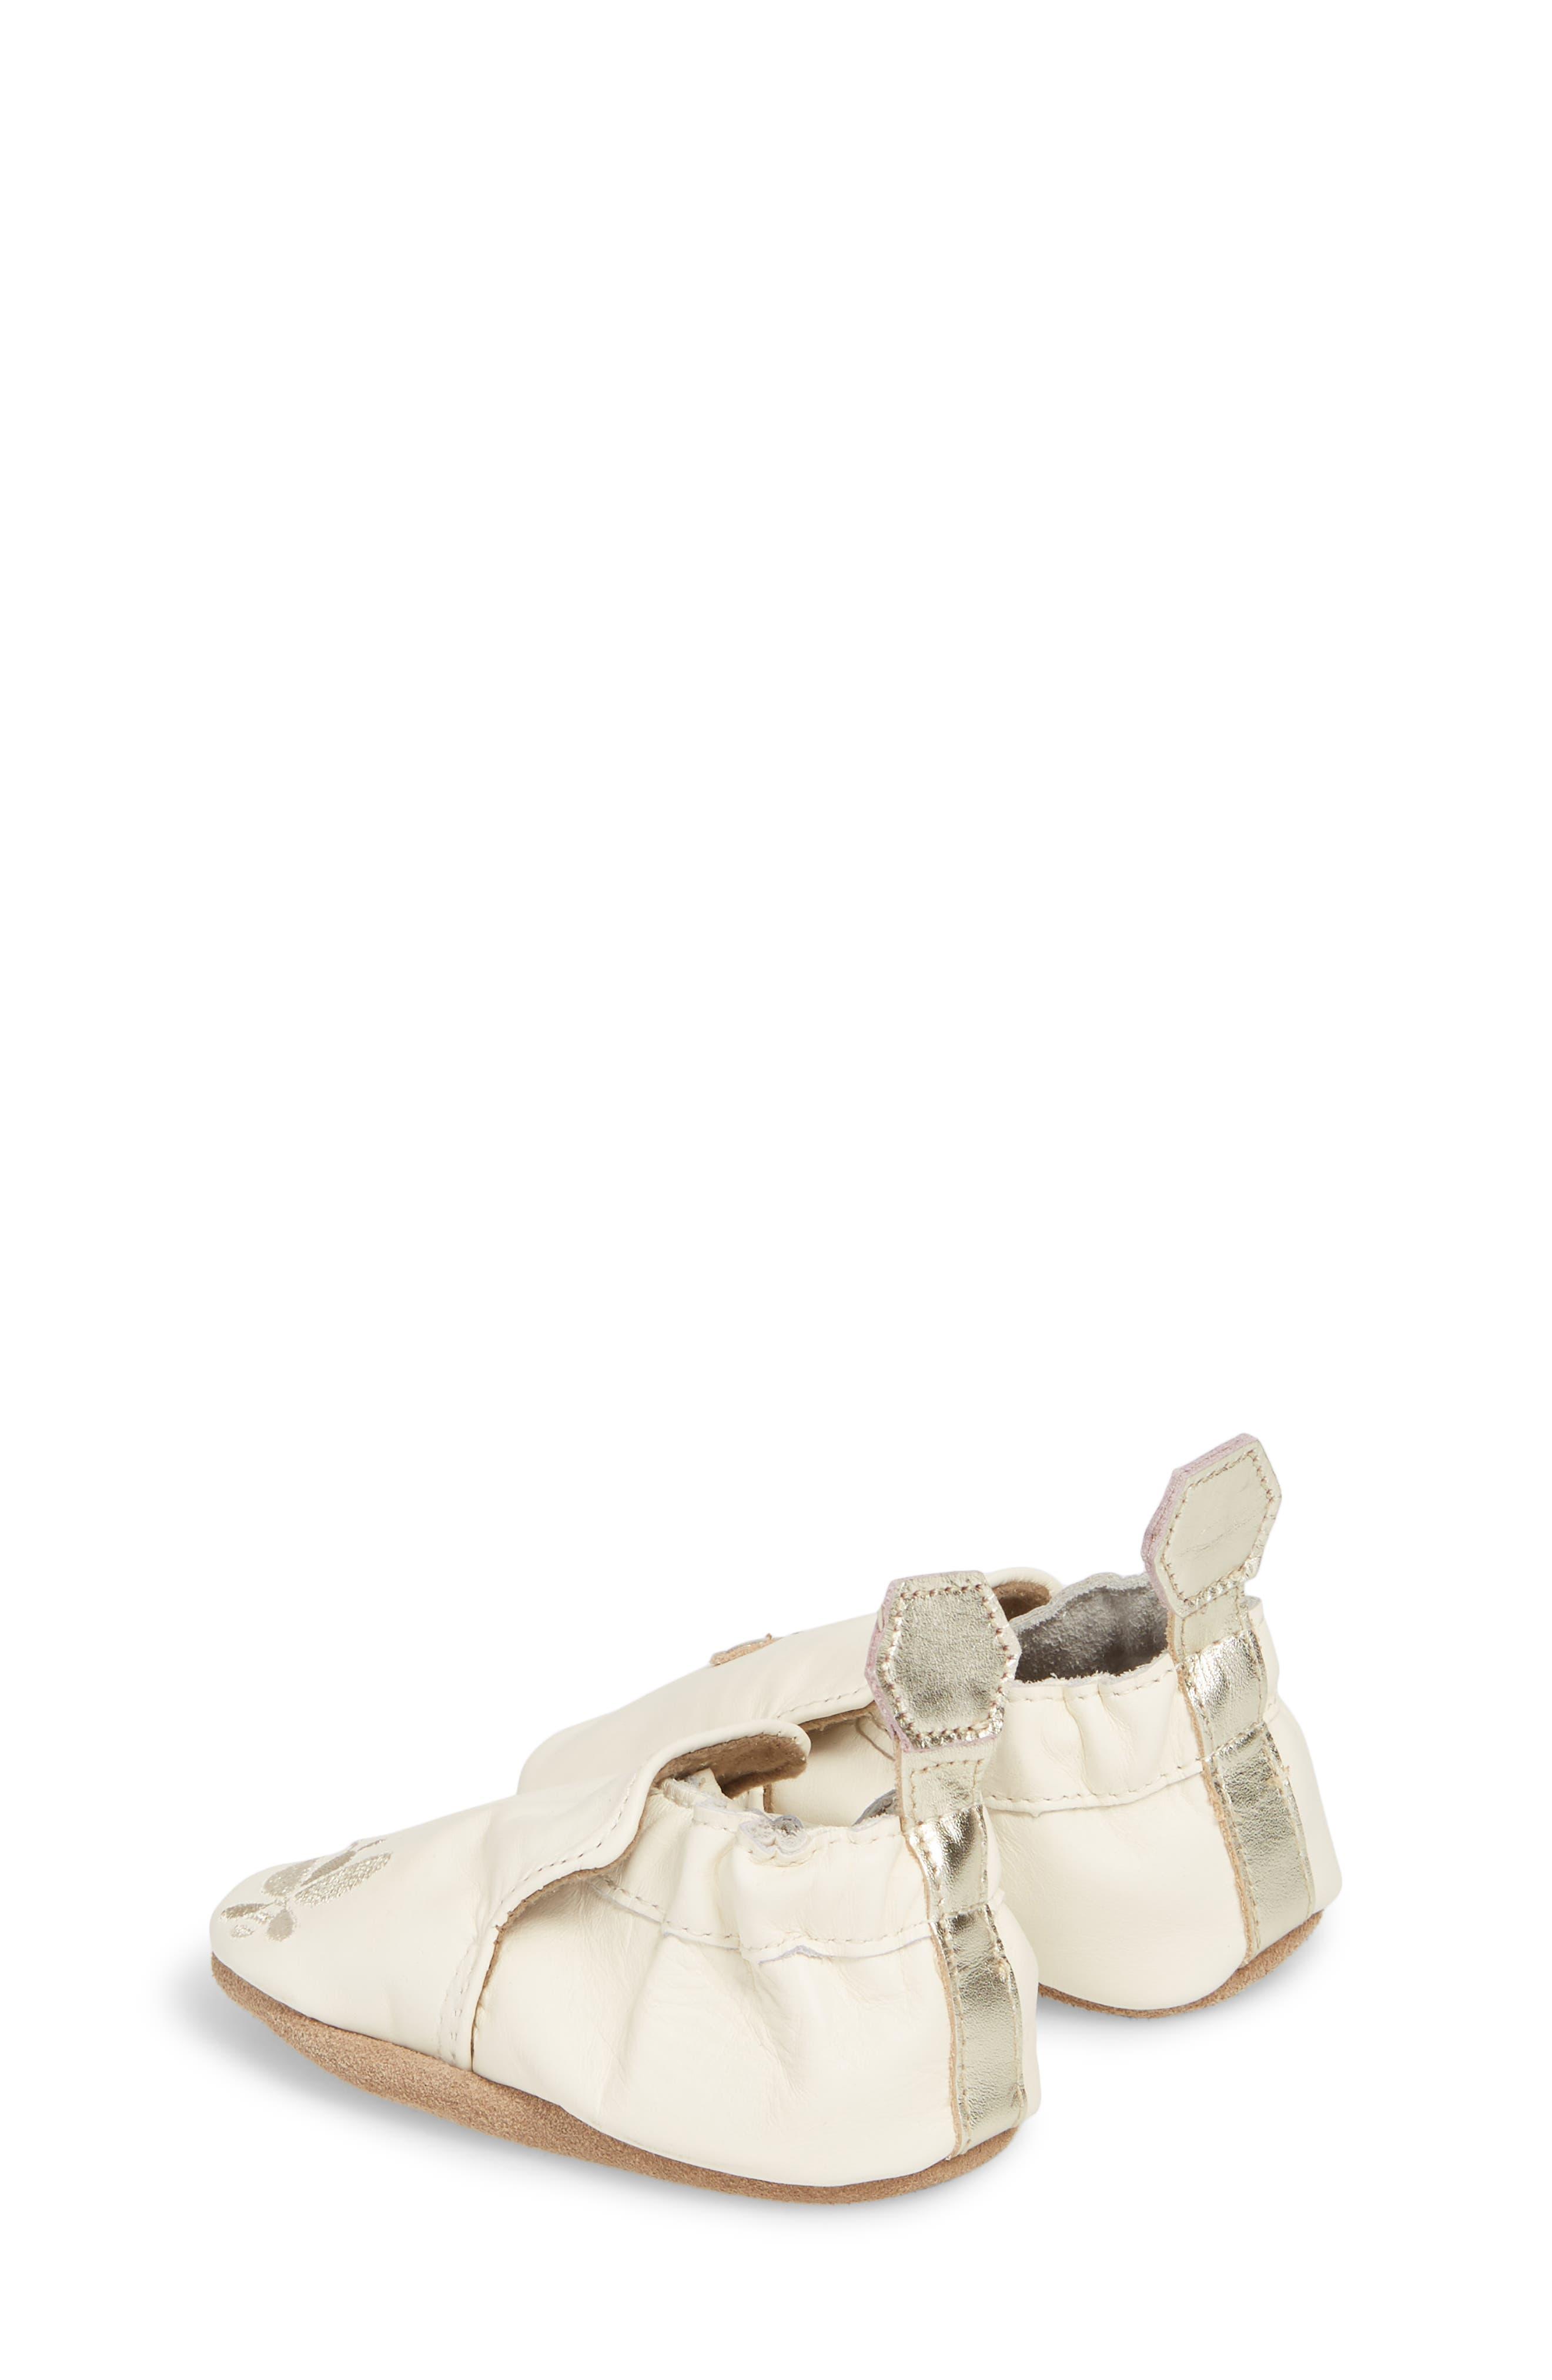 Bee Moccasin Sneaker,                             Alternate thumbnail 2, color,                             Cream